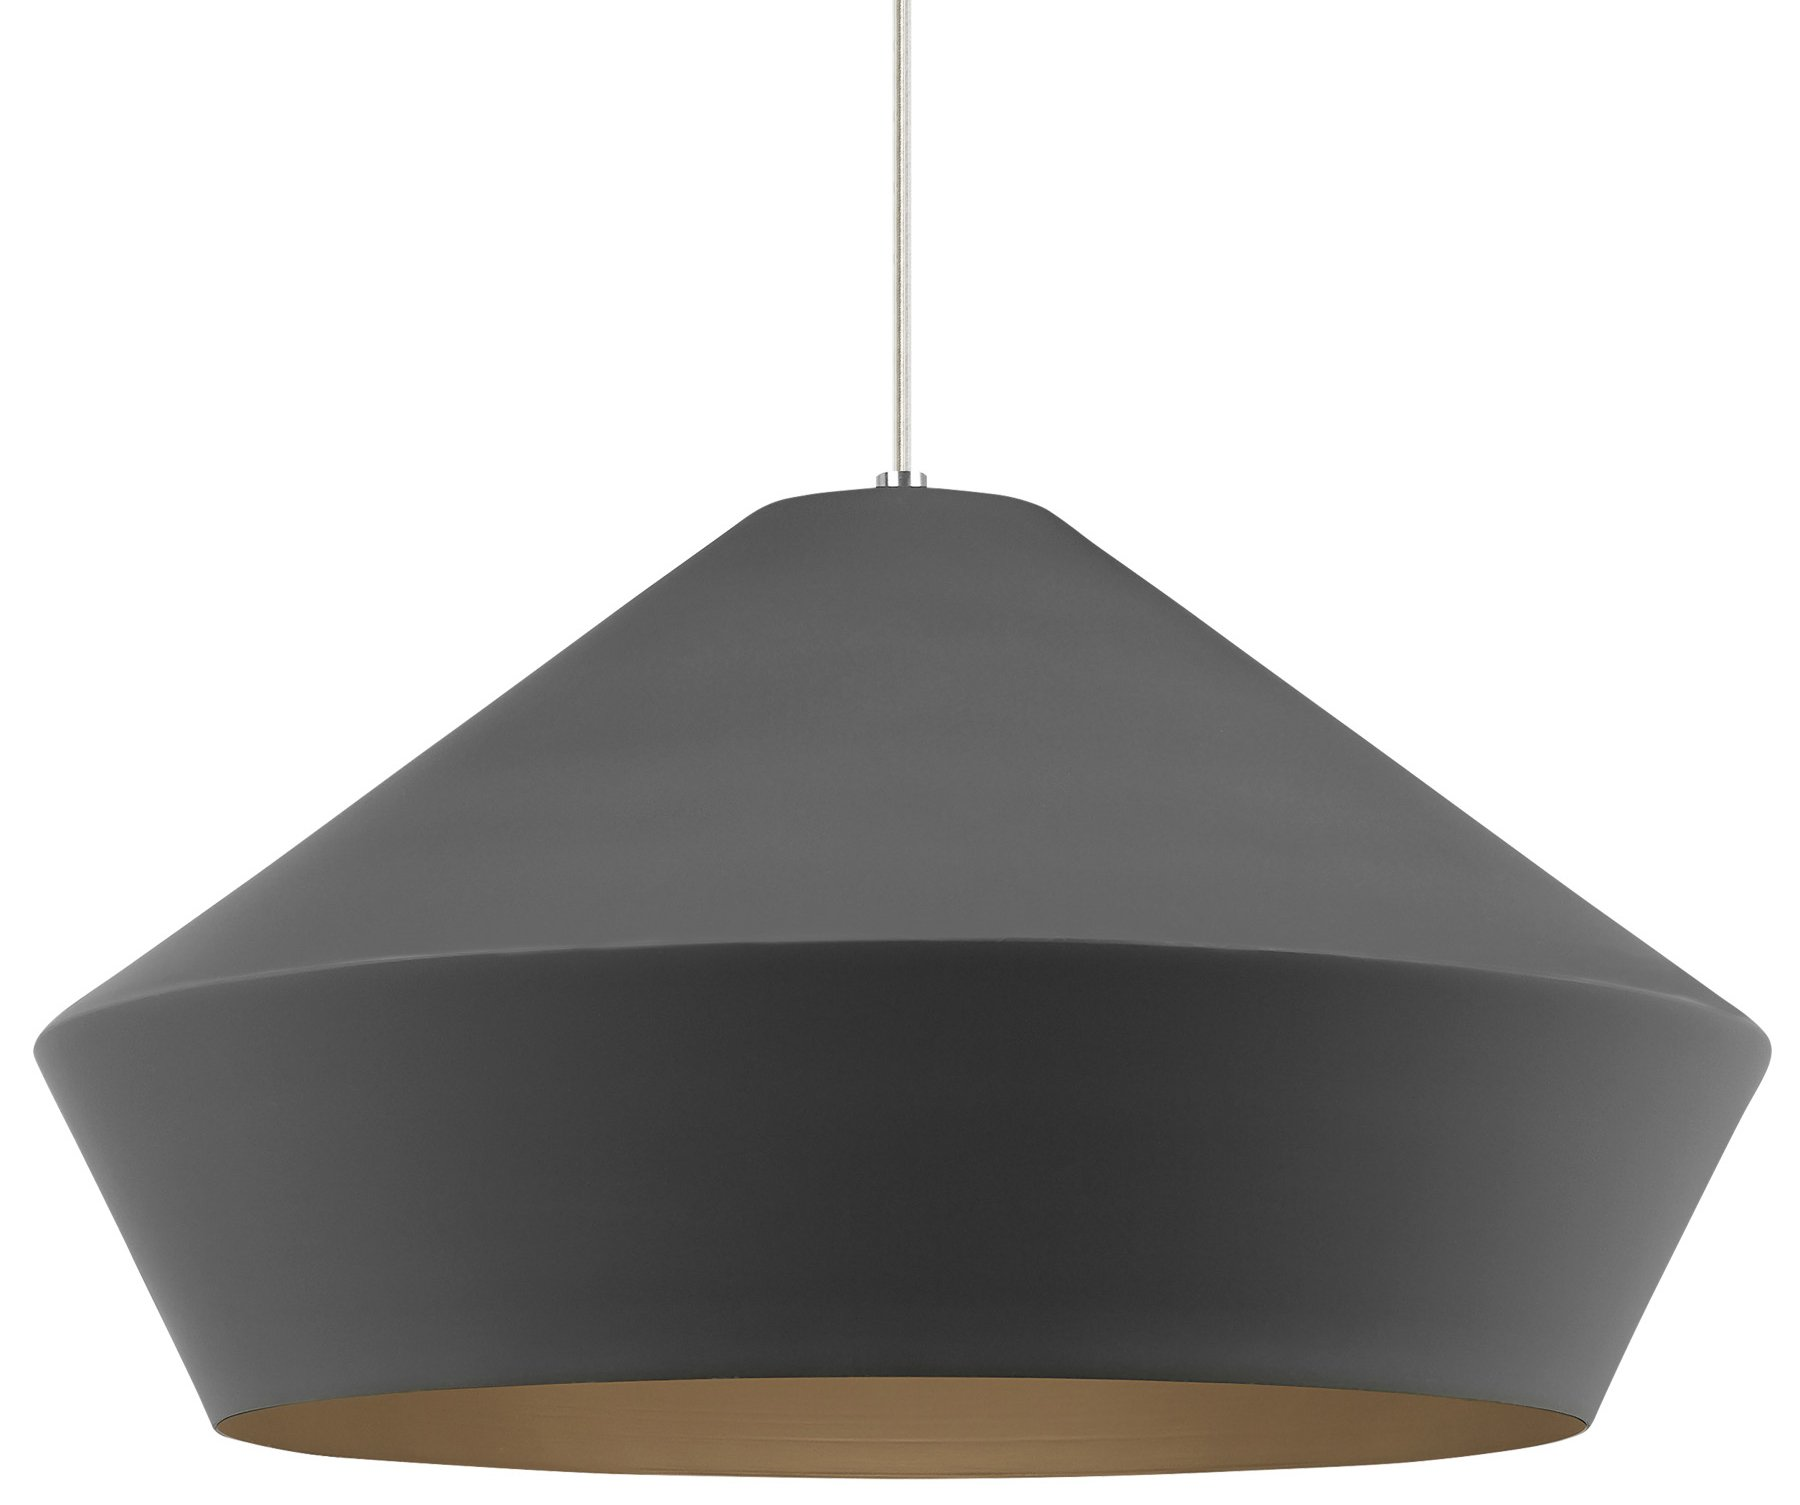 Y Charcoal Gray  sc 1 st  Arcadian Home & Tech Lighting 700TDBMLGP Brummel Grande Transitional Pendant Light ... azcodes.com